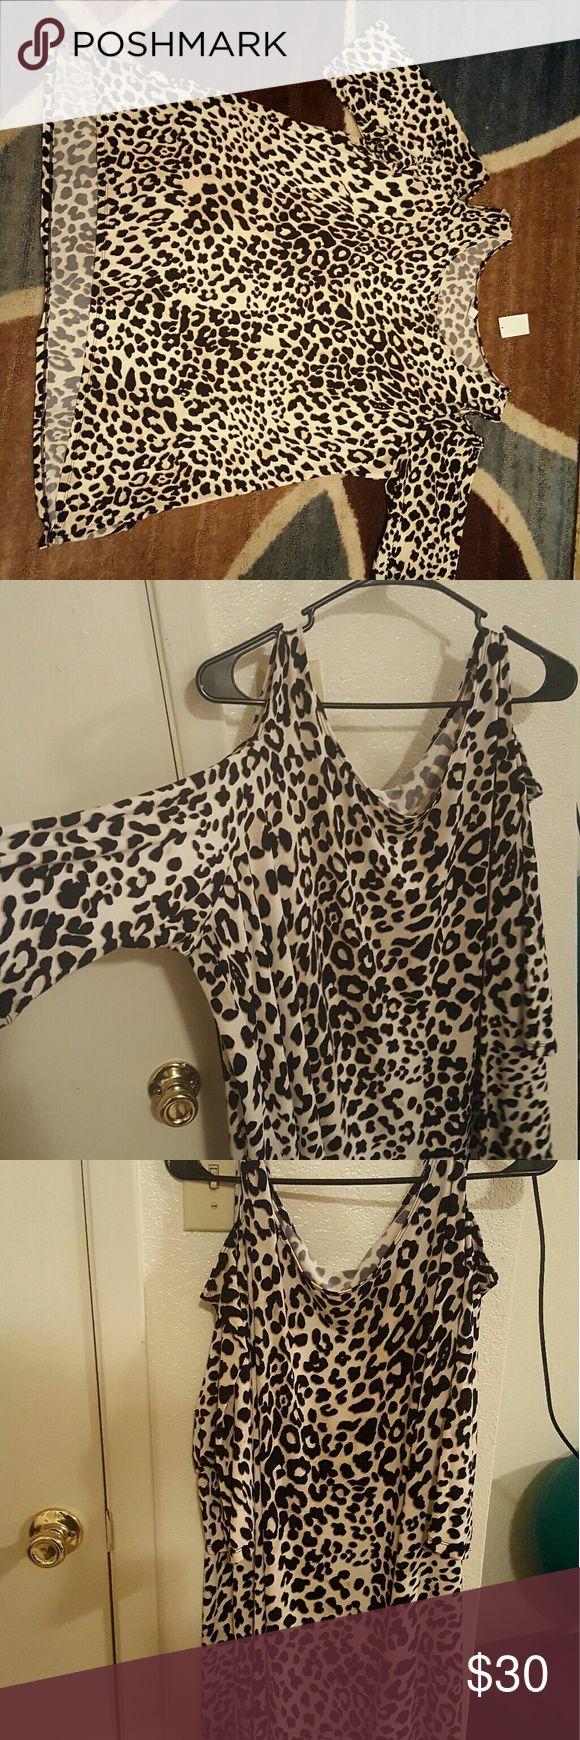 Fabulous cheetah print peek boo shoulder shirt This soft cheetah print peek boo shoulder shirt would like amzing with black waist belt, legging and cute heels Cato Tops Tunics